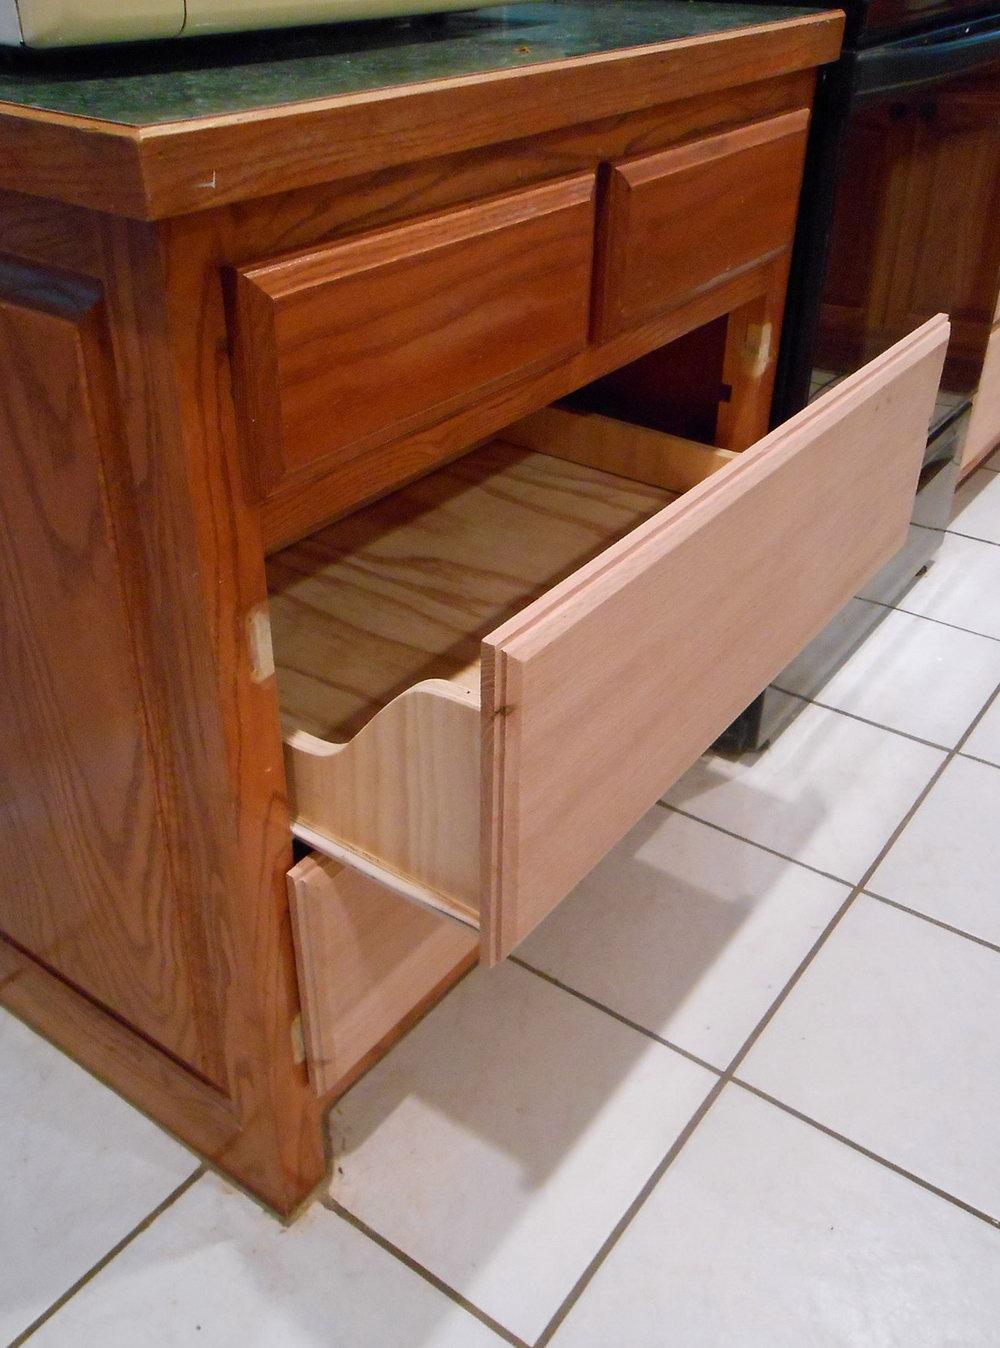 Kitchen Cabinets Drawers Design